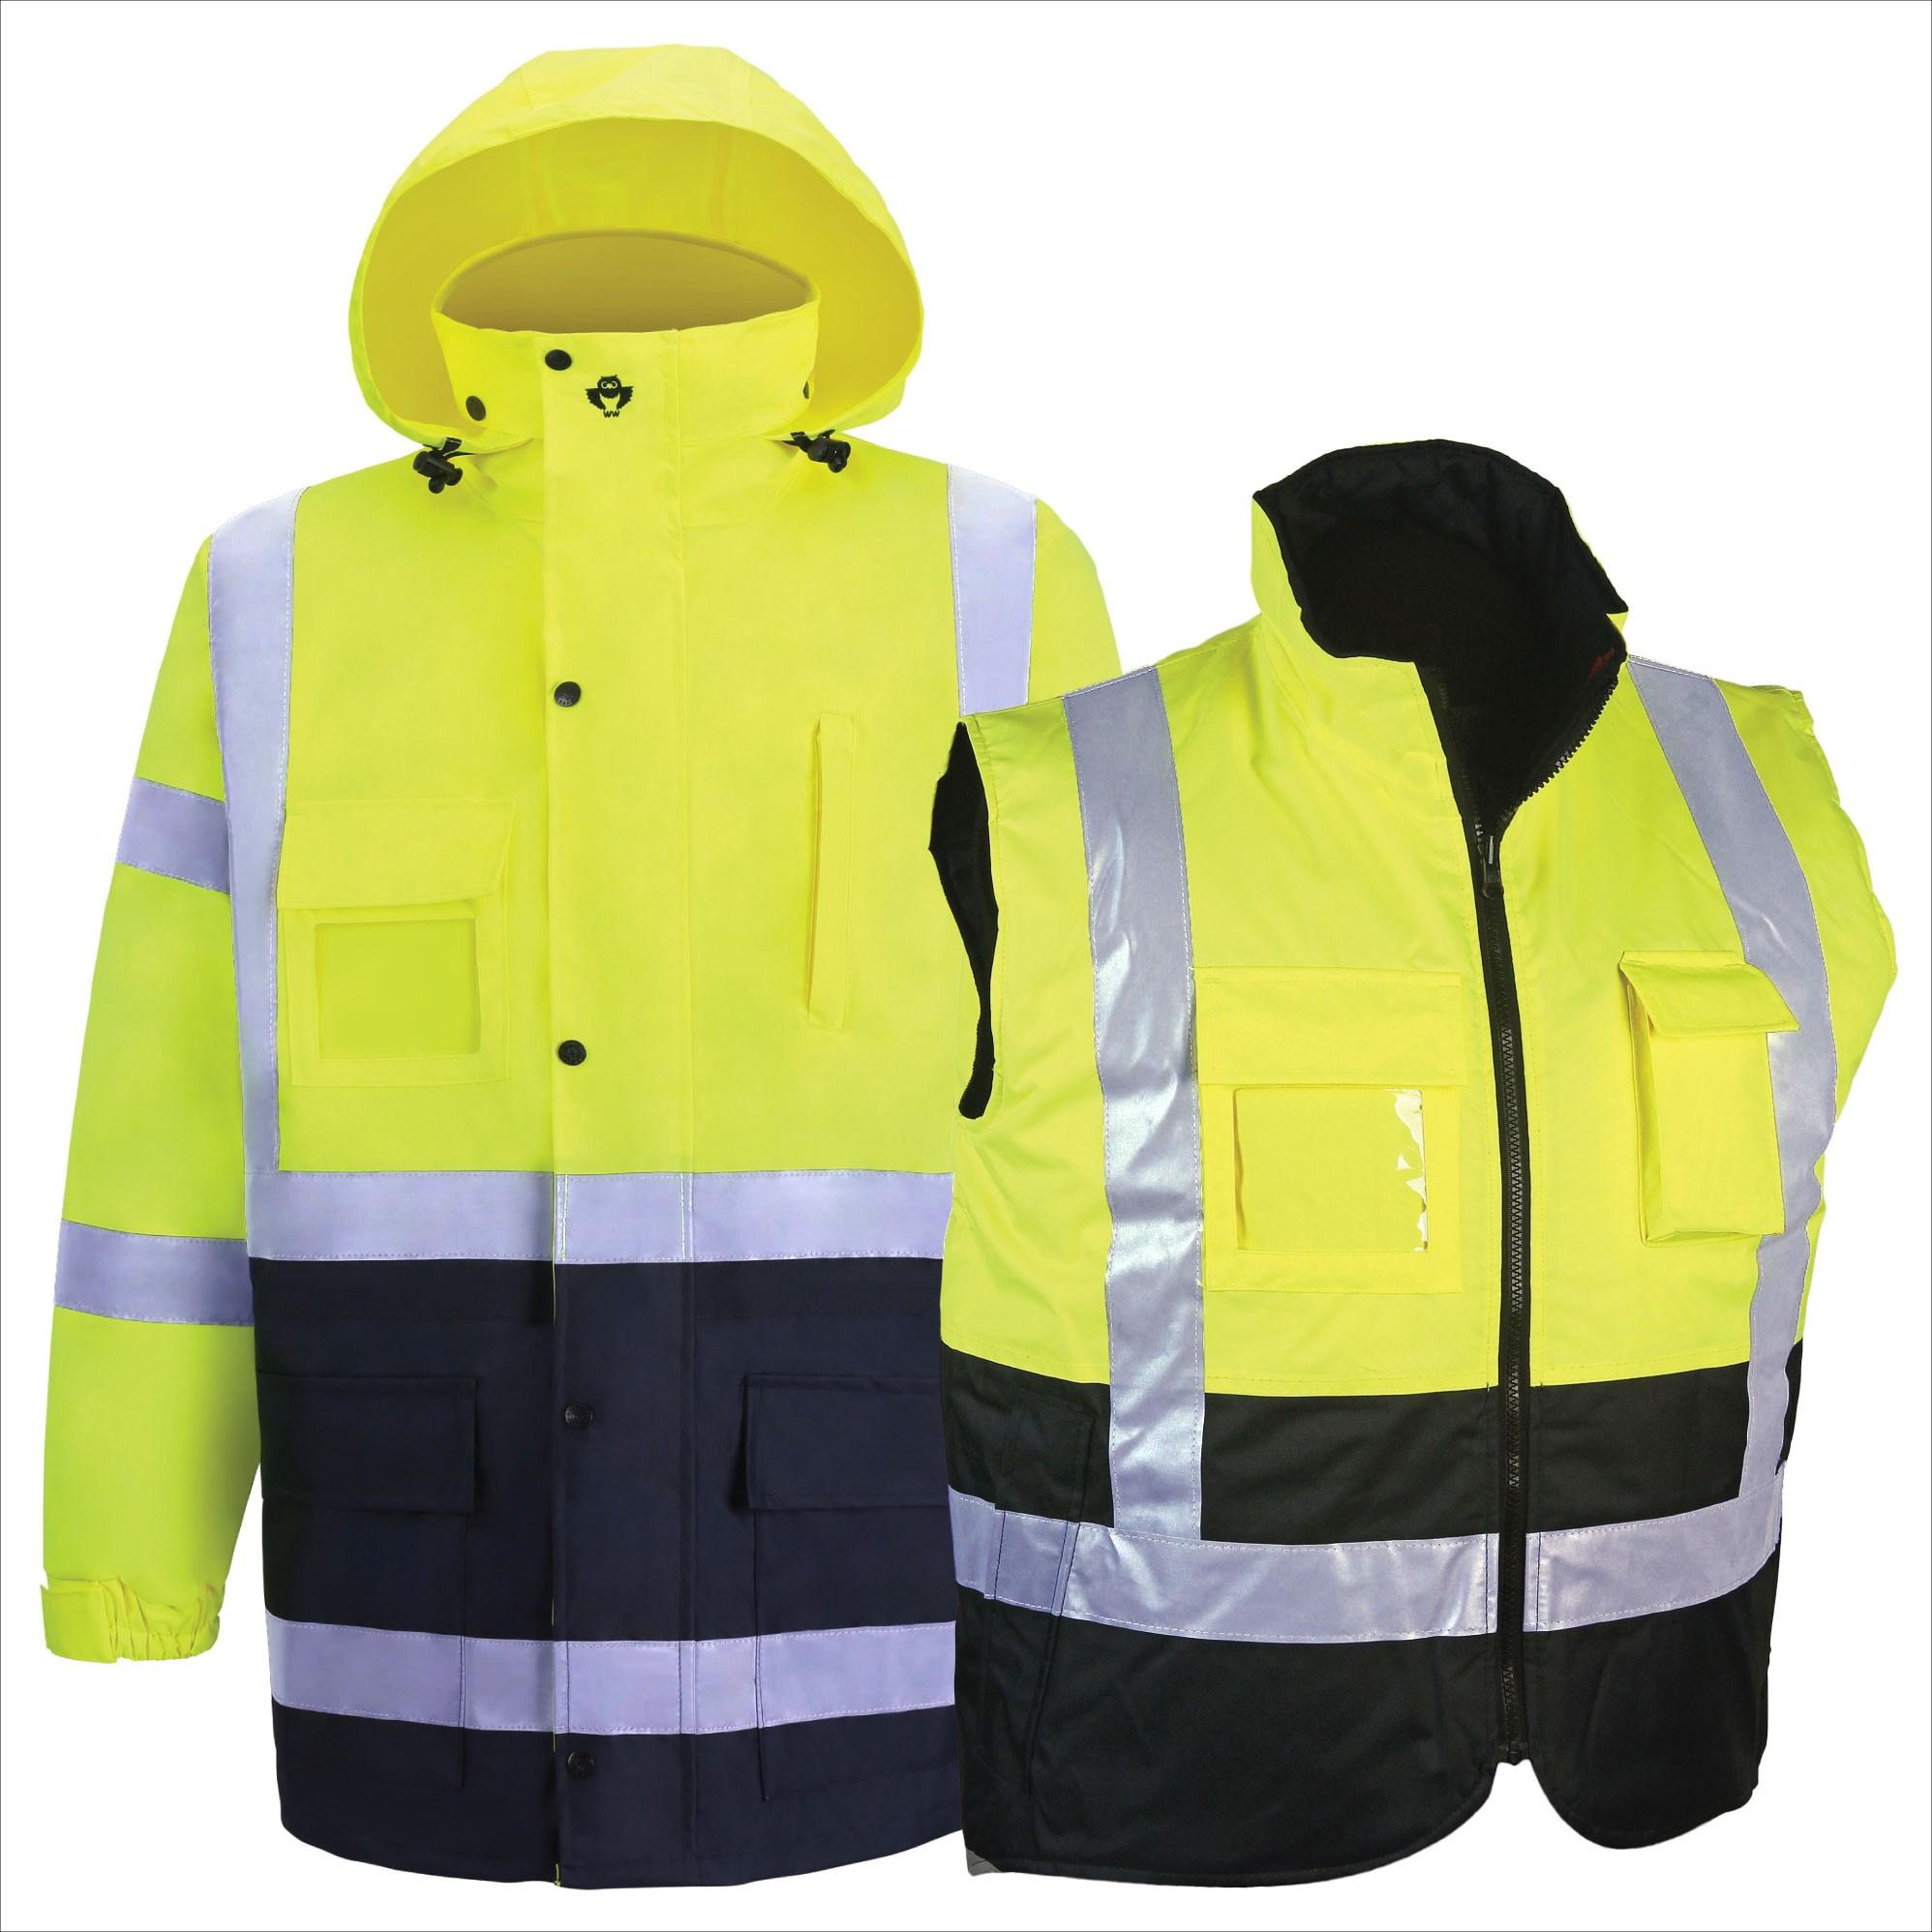 Class 3 Winter Parka-Capp Uniform Services